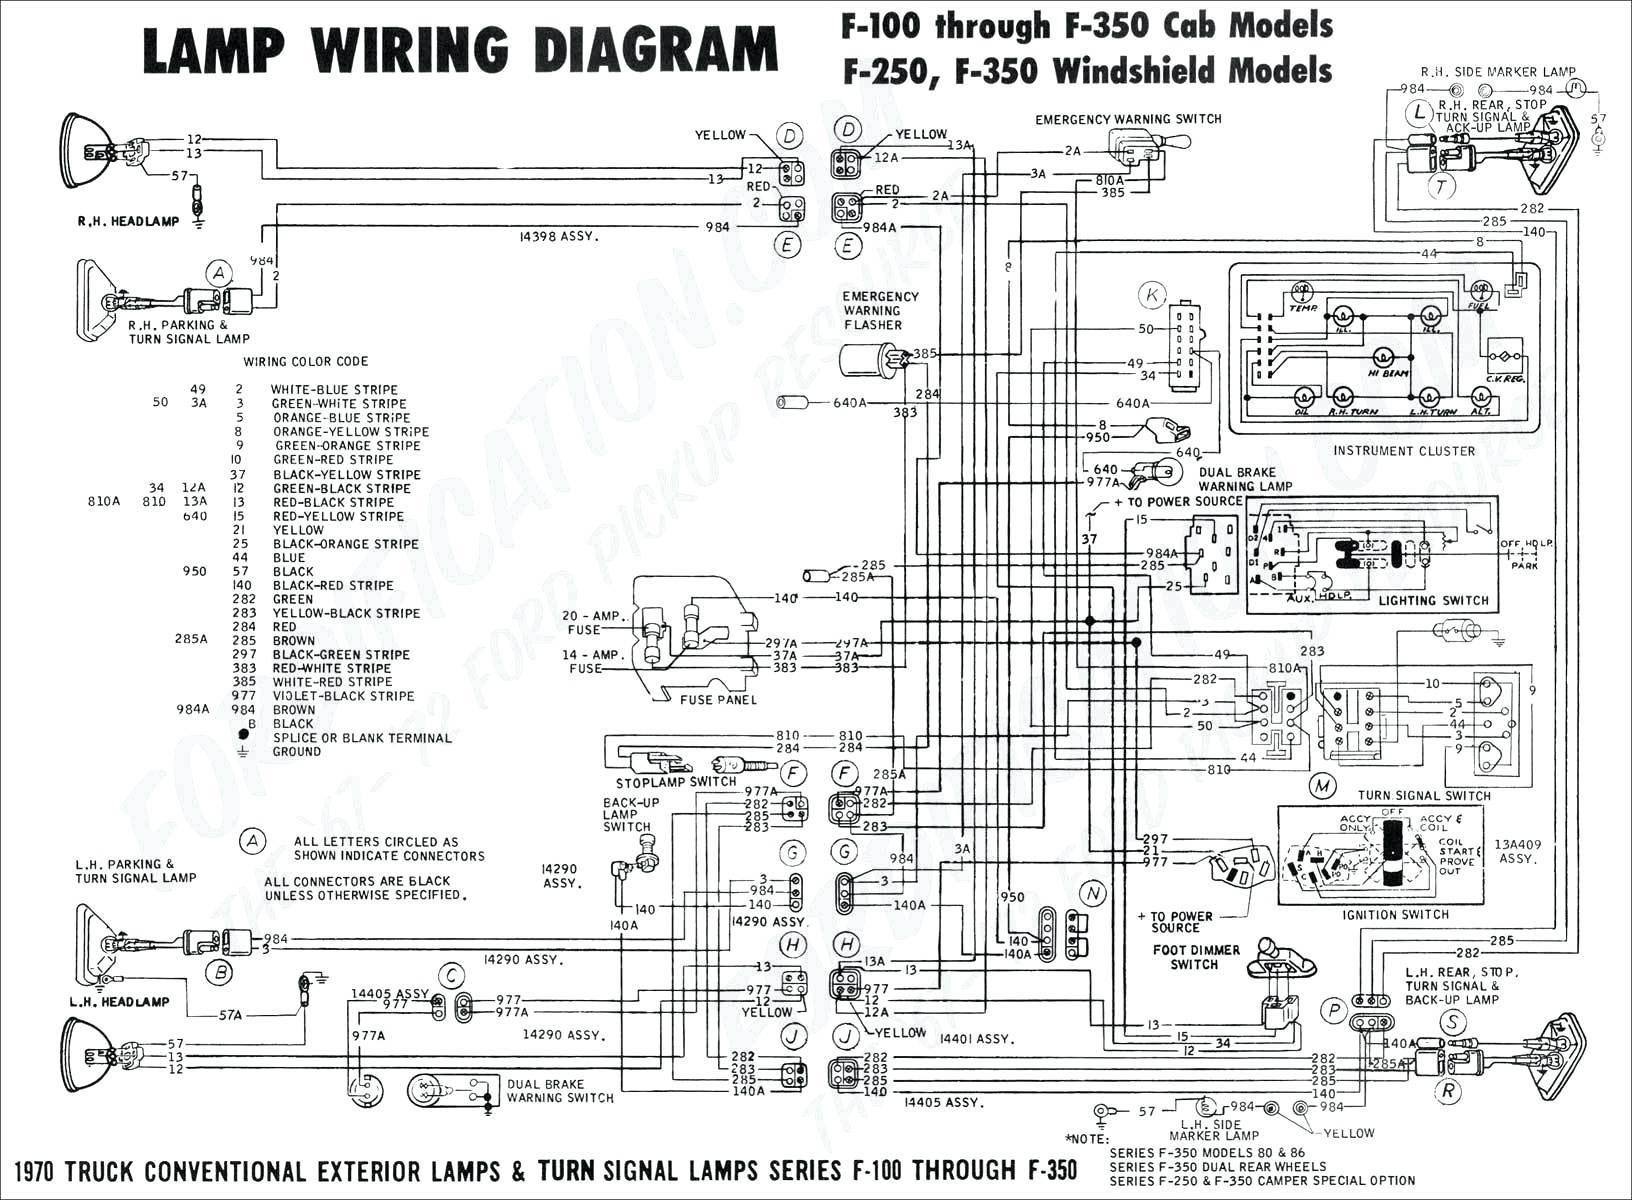 2007 Pontiac G6 Wiring Diagram 2001 F250 7 3 Wireing